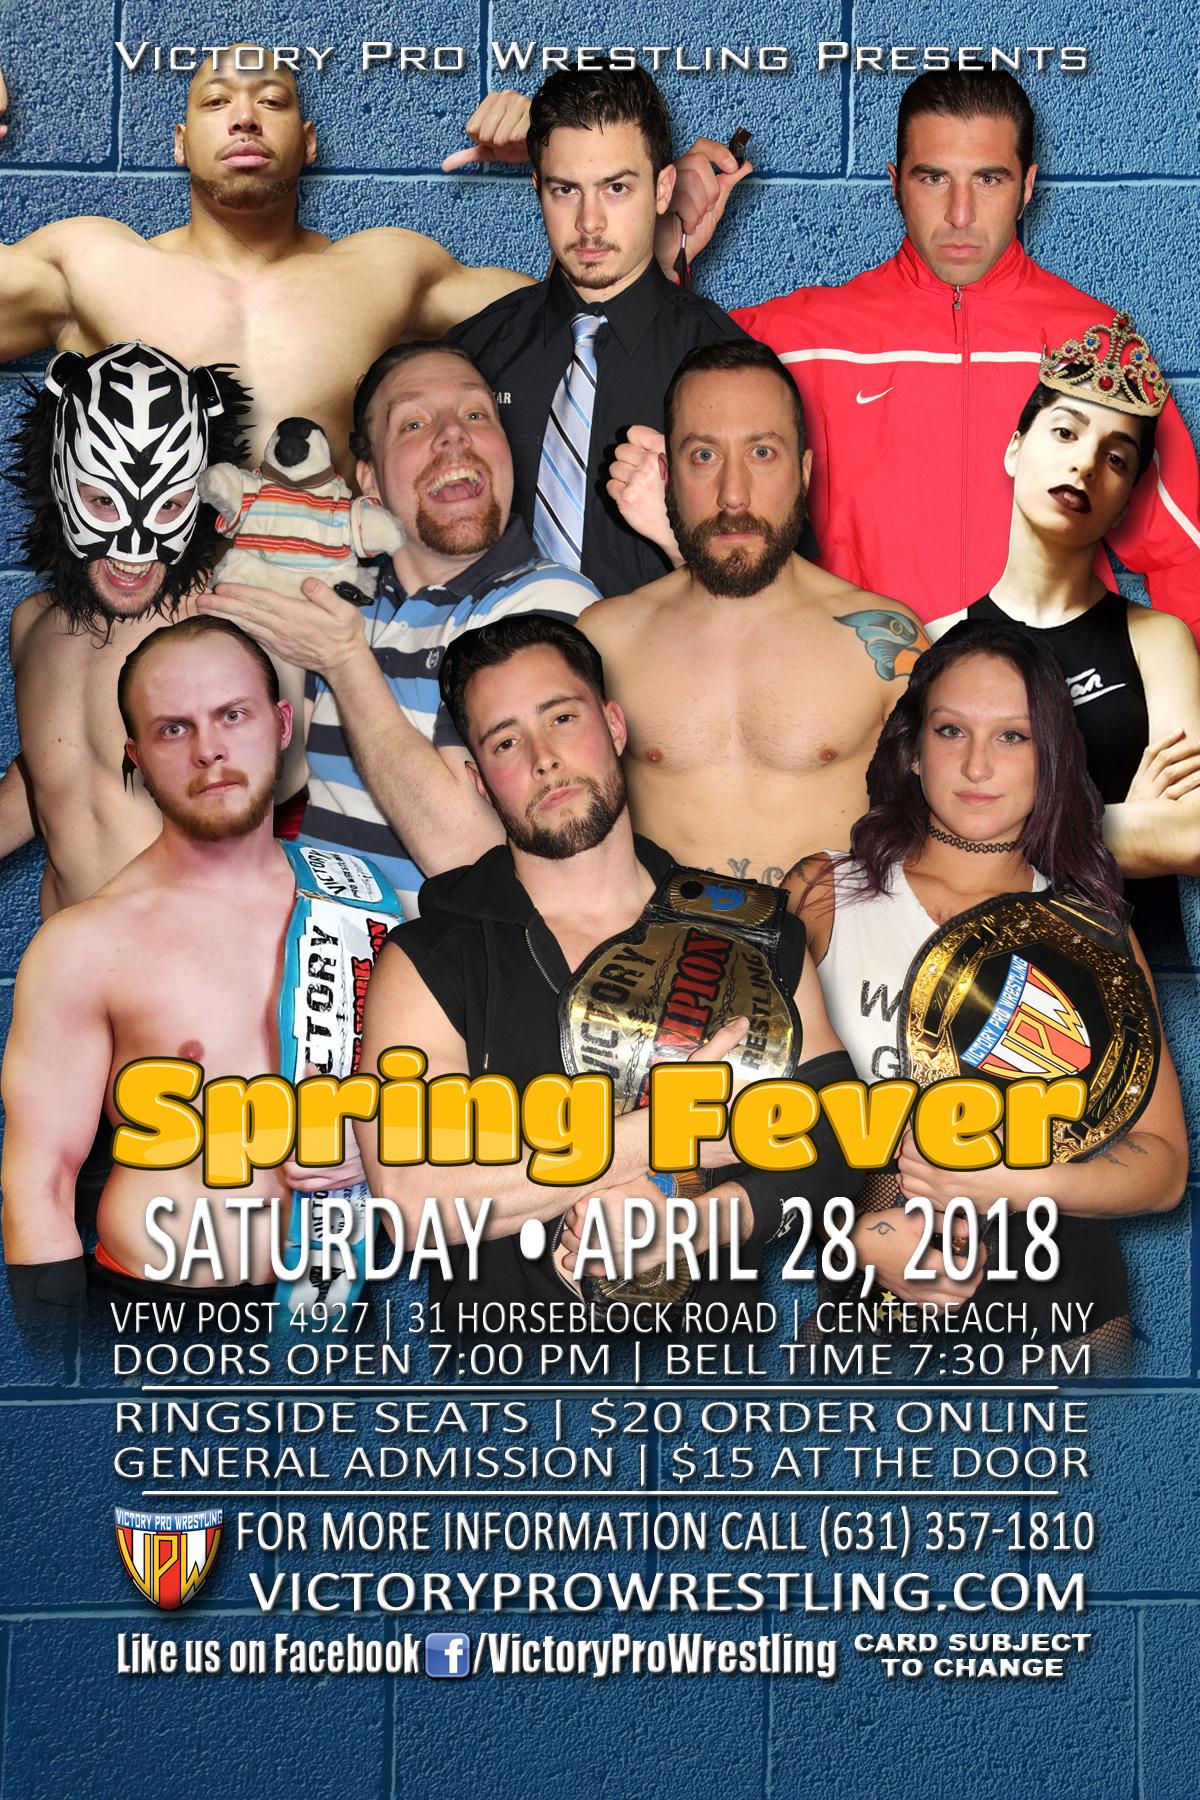 VPW presents Spring Fever, April 28 2018